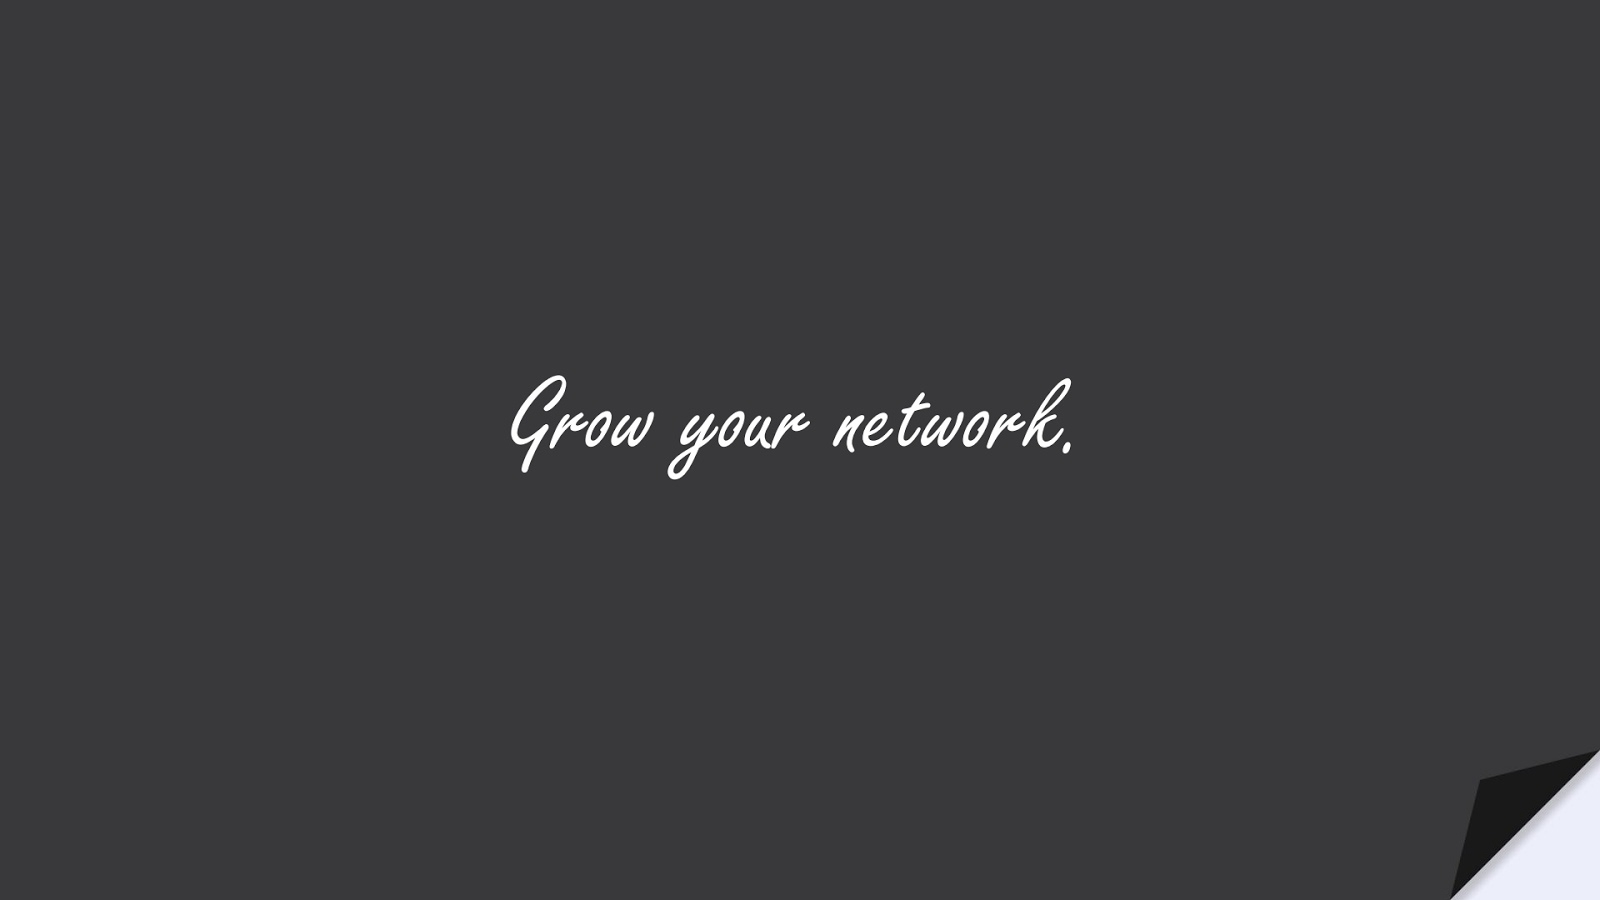 Grow your network.FALSE